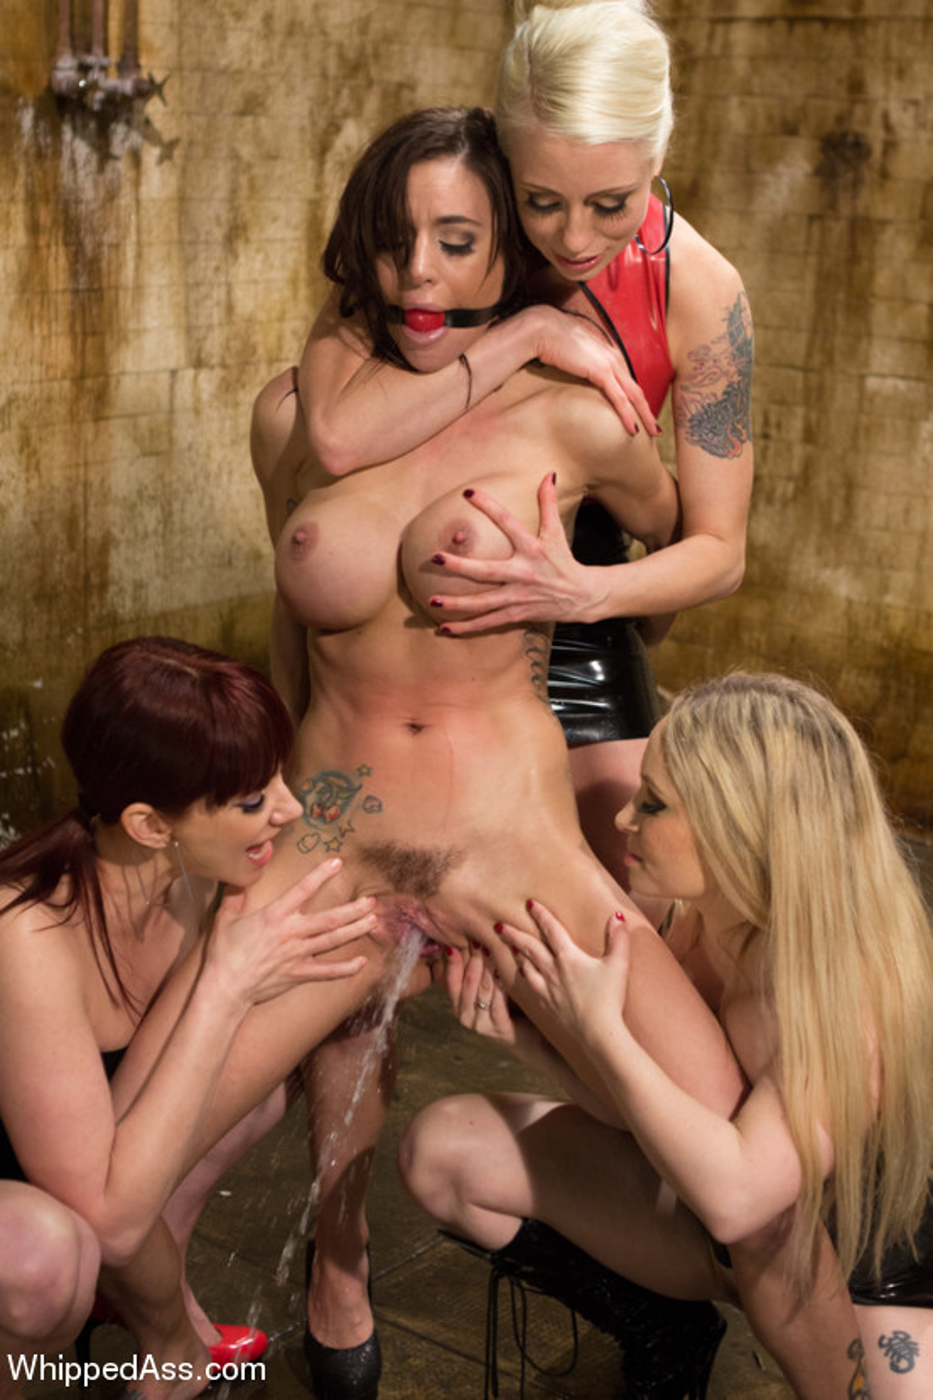 Порно фото бдсм лесби бесплатно